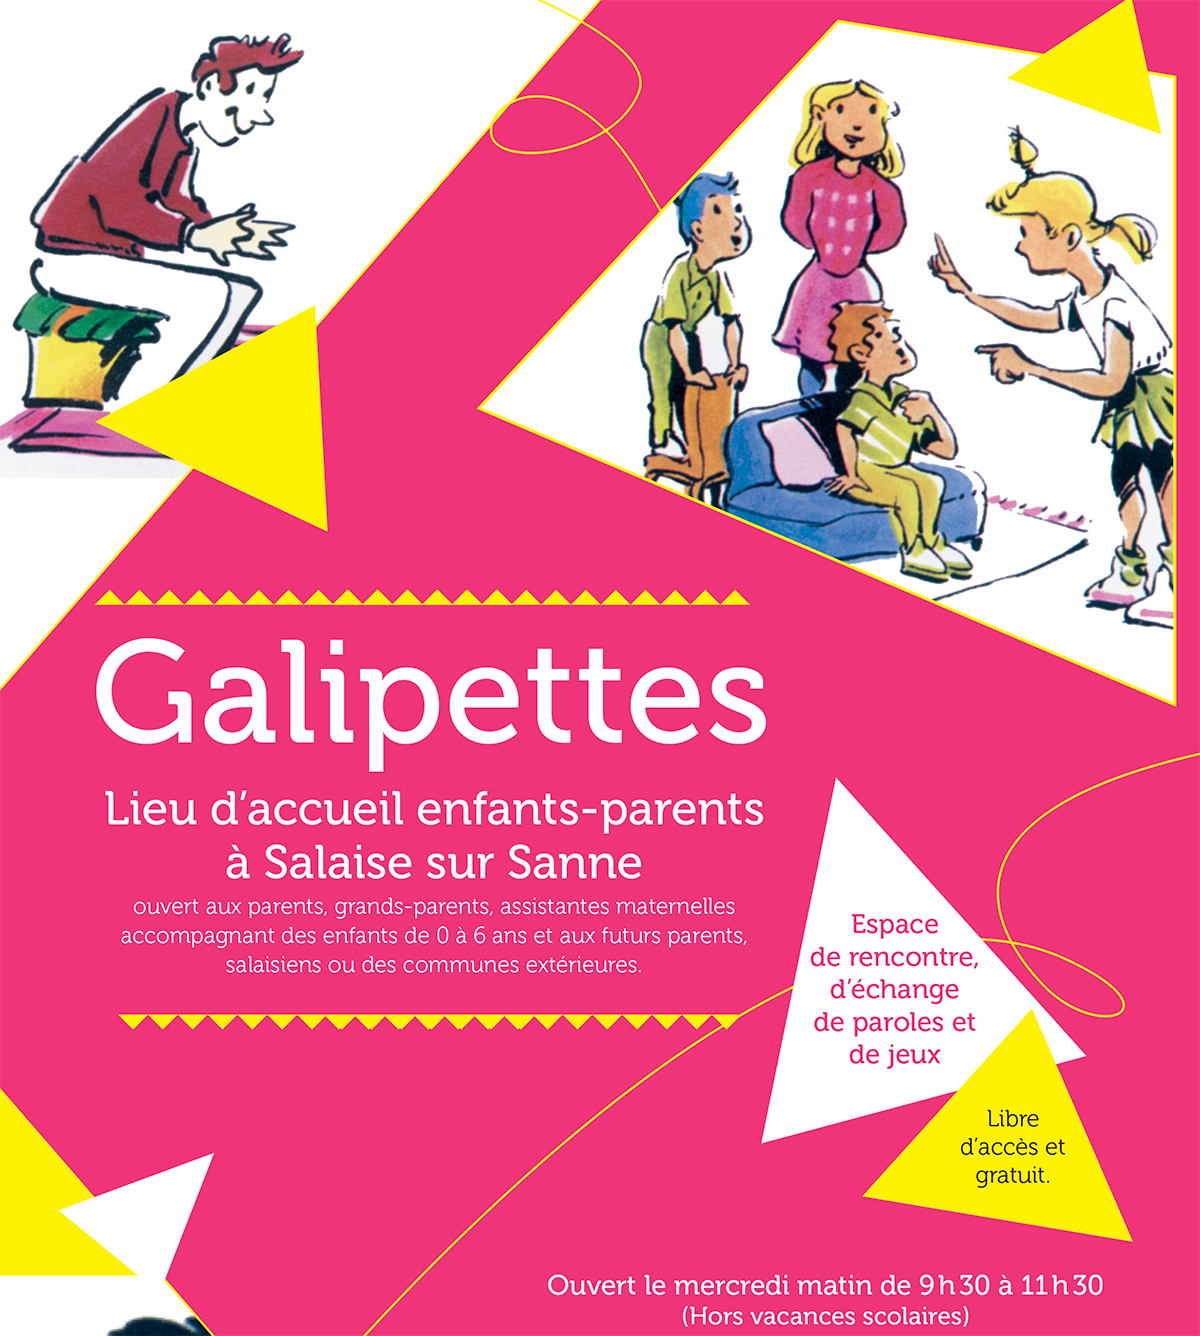 illustration-Galipettes.jpg